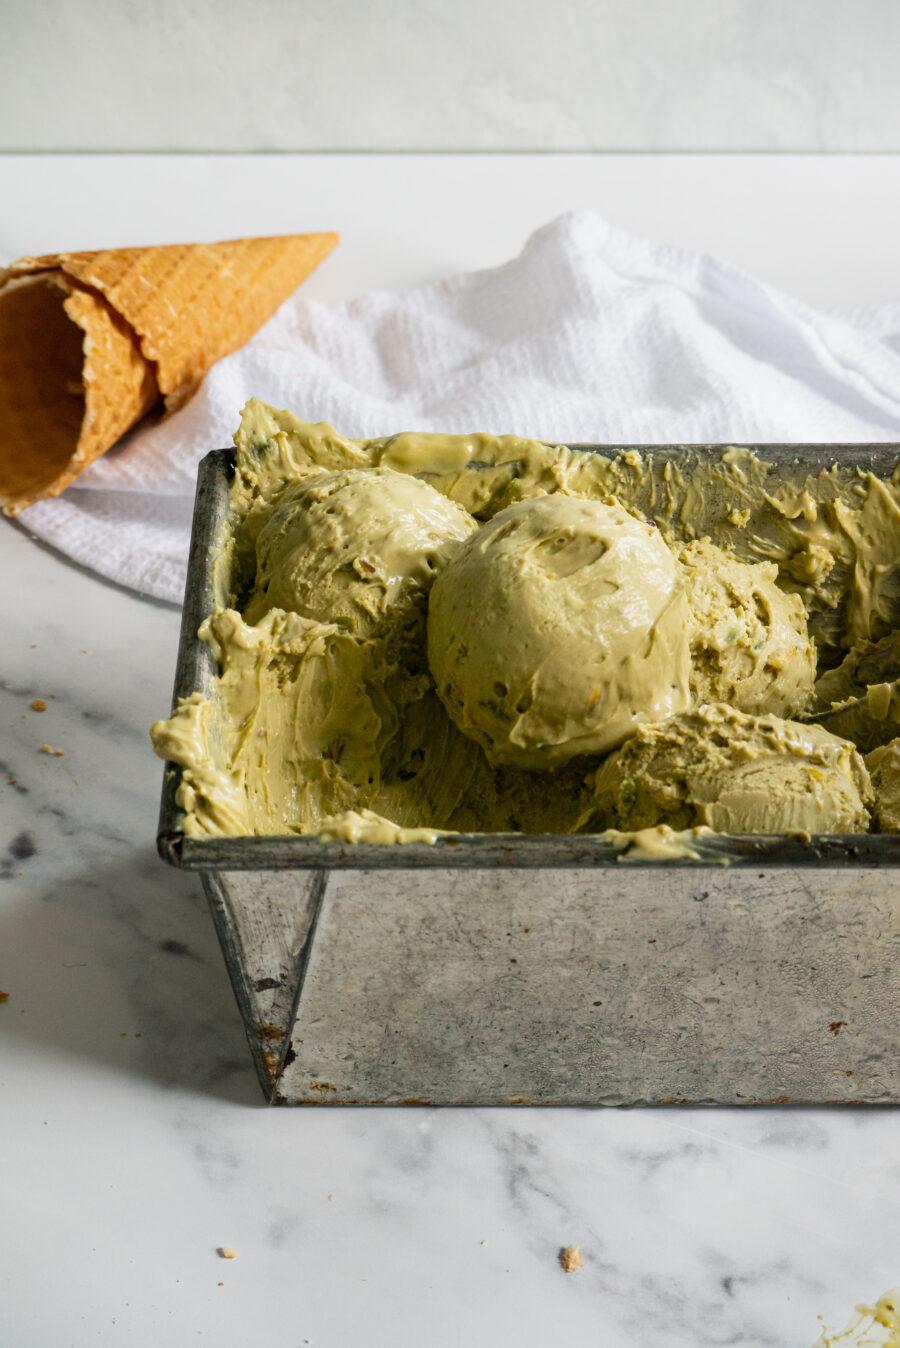 Pistachio no-churn ice cream